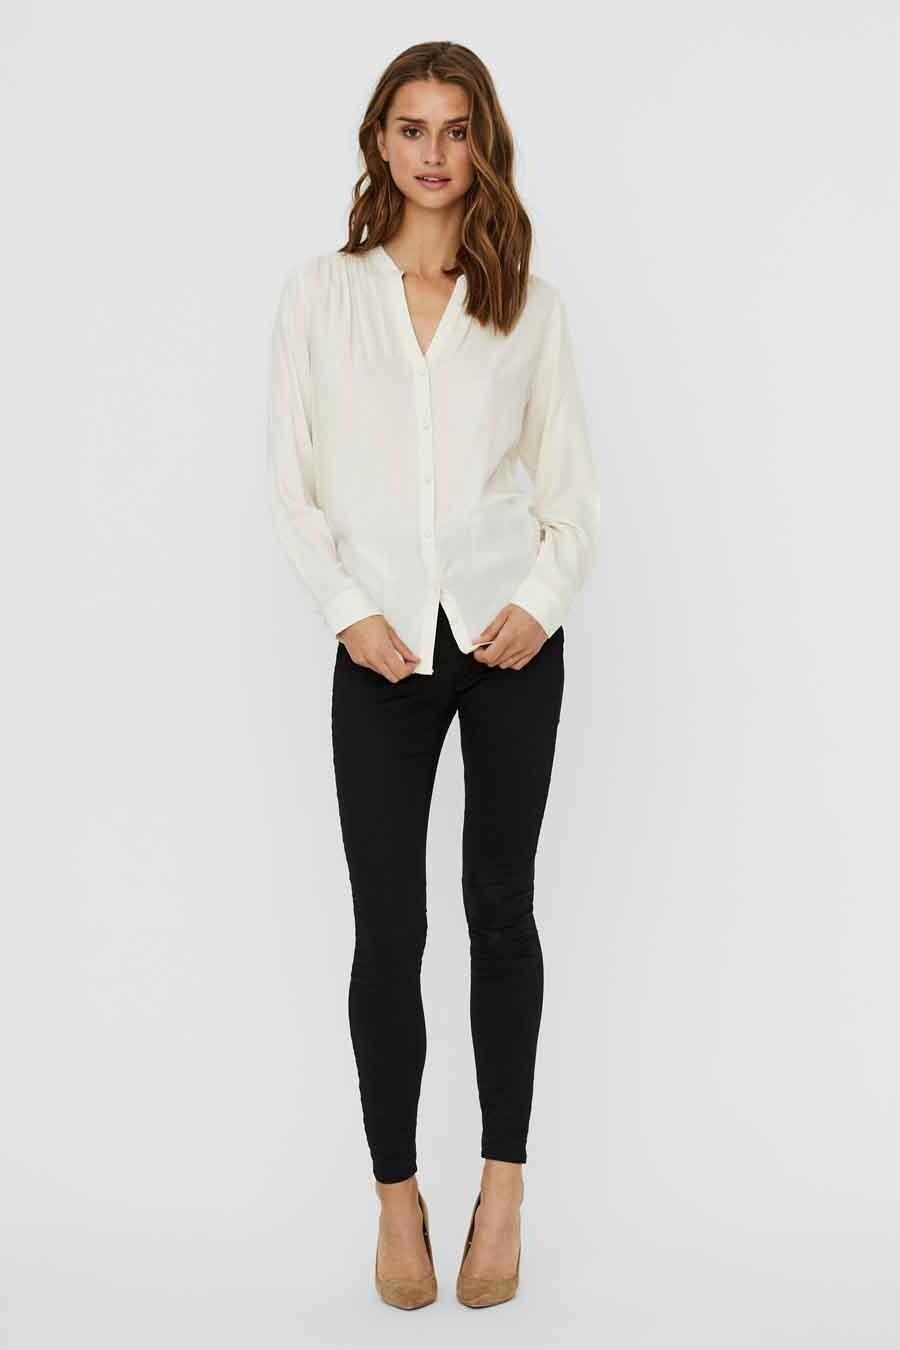 Vero Moda® Blouse lange mouwen, Beige, Dames, Maat: L/M/S/XS